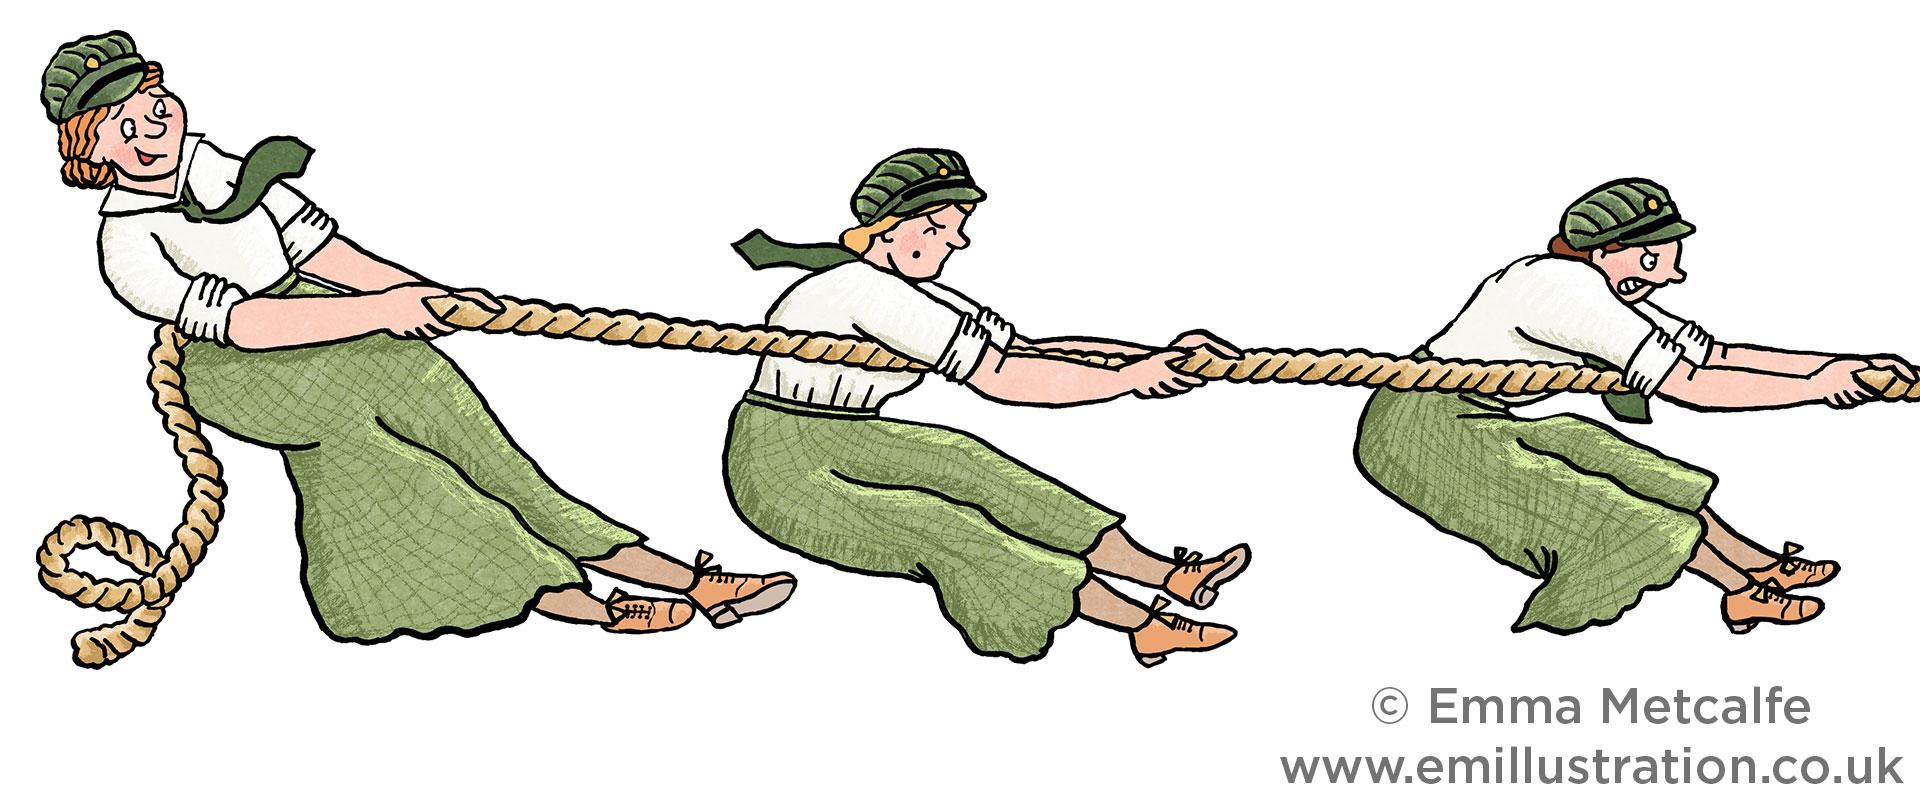 First World War Red Cross Women Ambulance Drivers playing Tug O War at Sports Day by Illustrator Emma Metcalfe